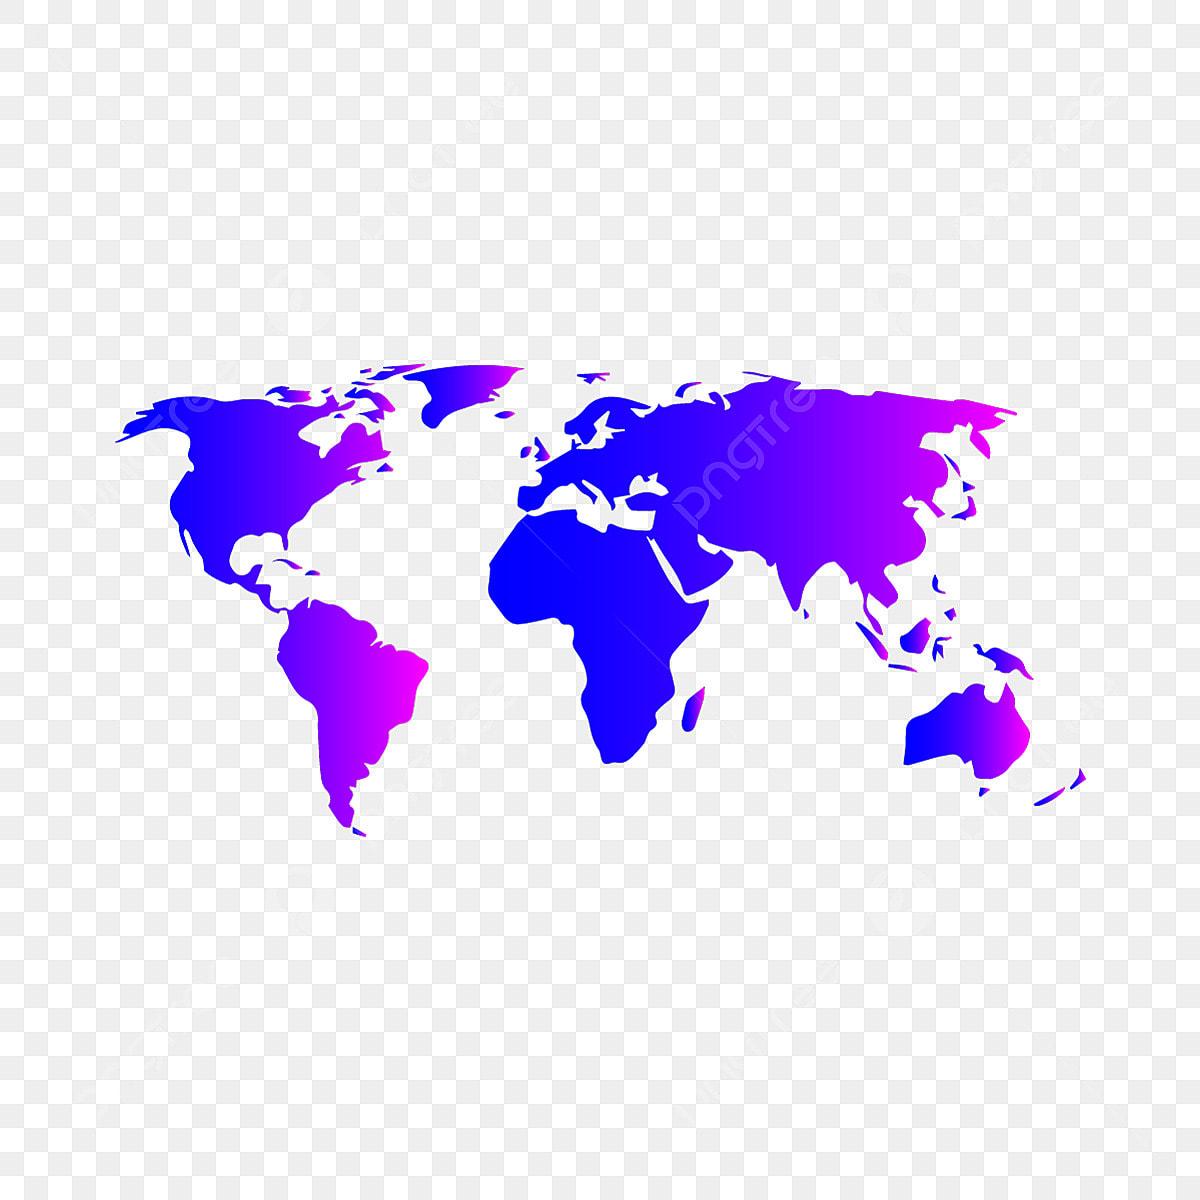 World Map, World Clipart, Map Clipart, Watermark World Map ... on tree art, tree africa, tree wallpapers, kandy sri lanka map, tree house, tree world app, tree world book, warframe map, tree kangaroo map, tree mind map, tree white, create a tree map, tree usa, tree zone map, tree japan, tree world critters, tree of life map, tree globe, tree climbing goats united states,